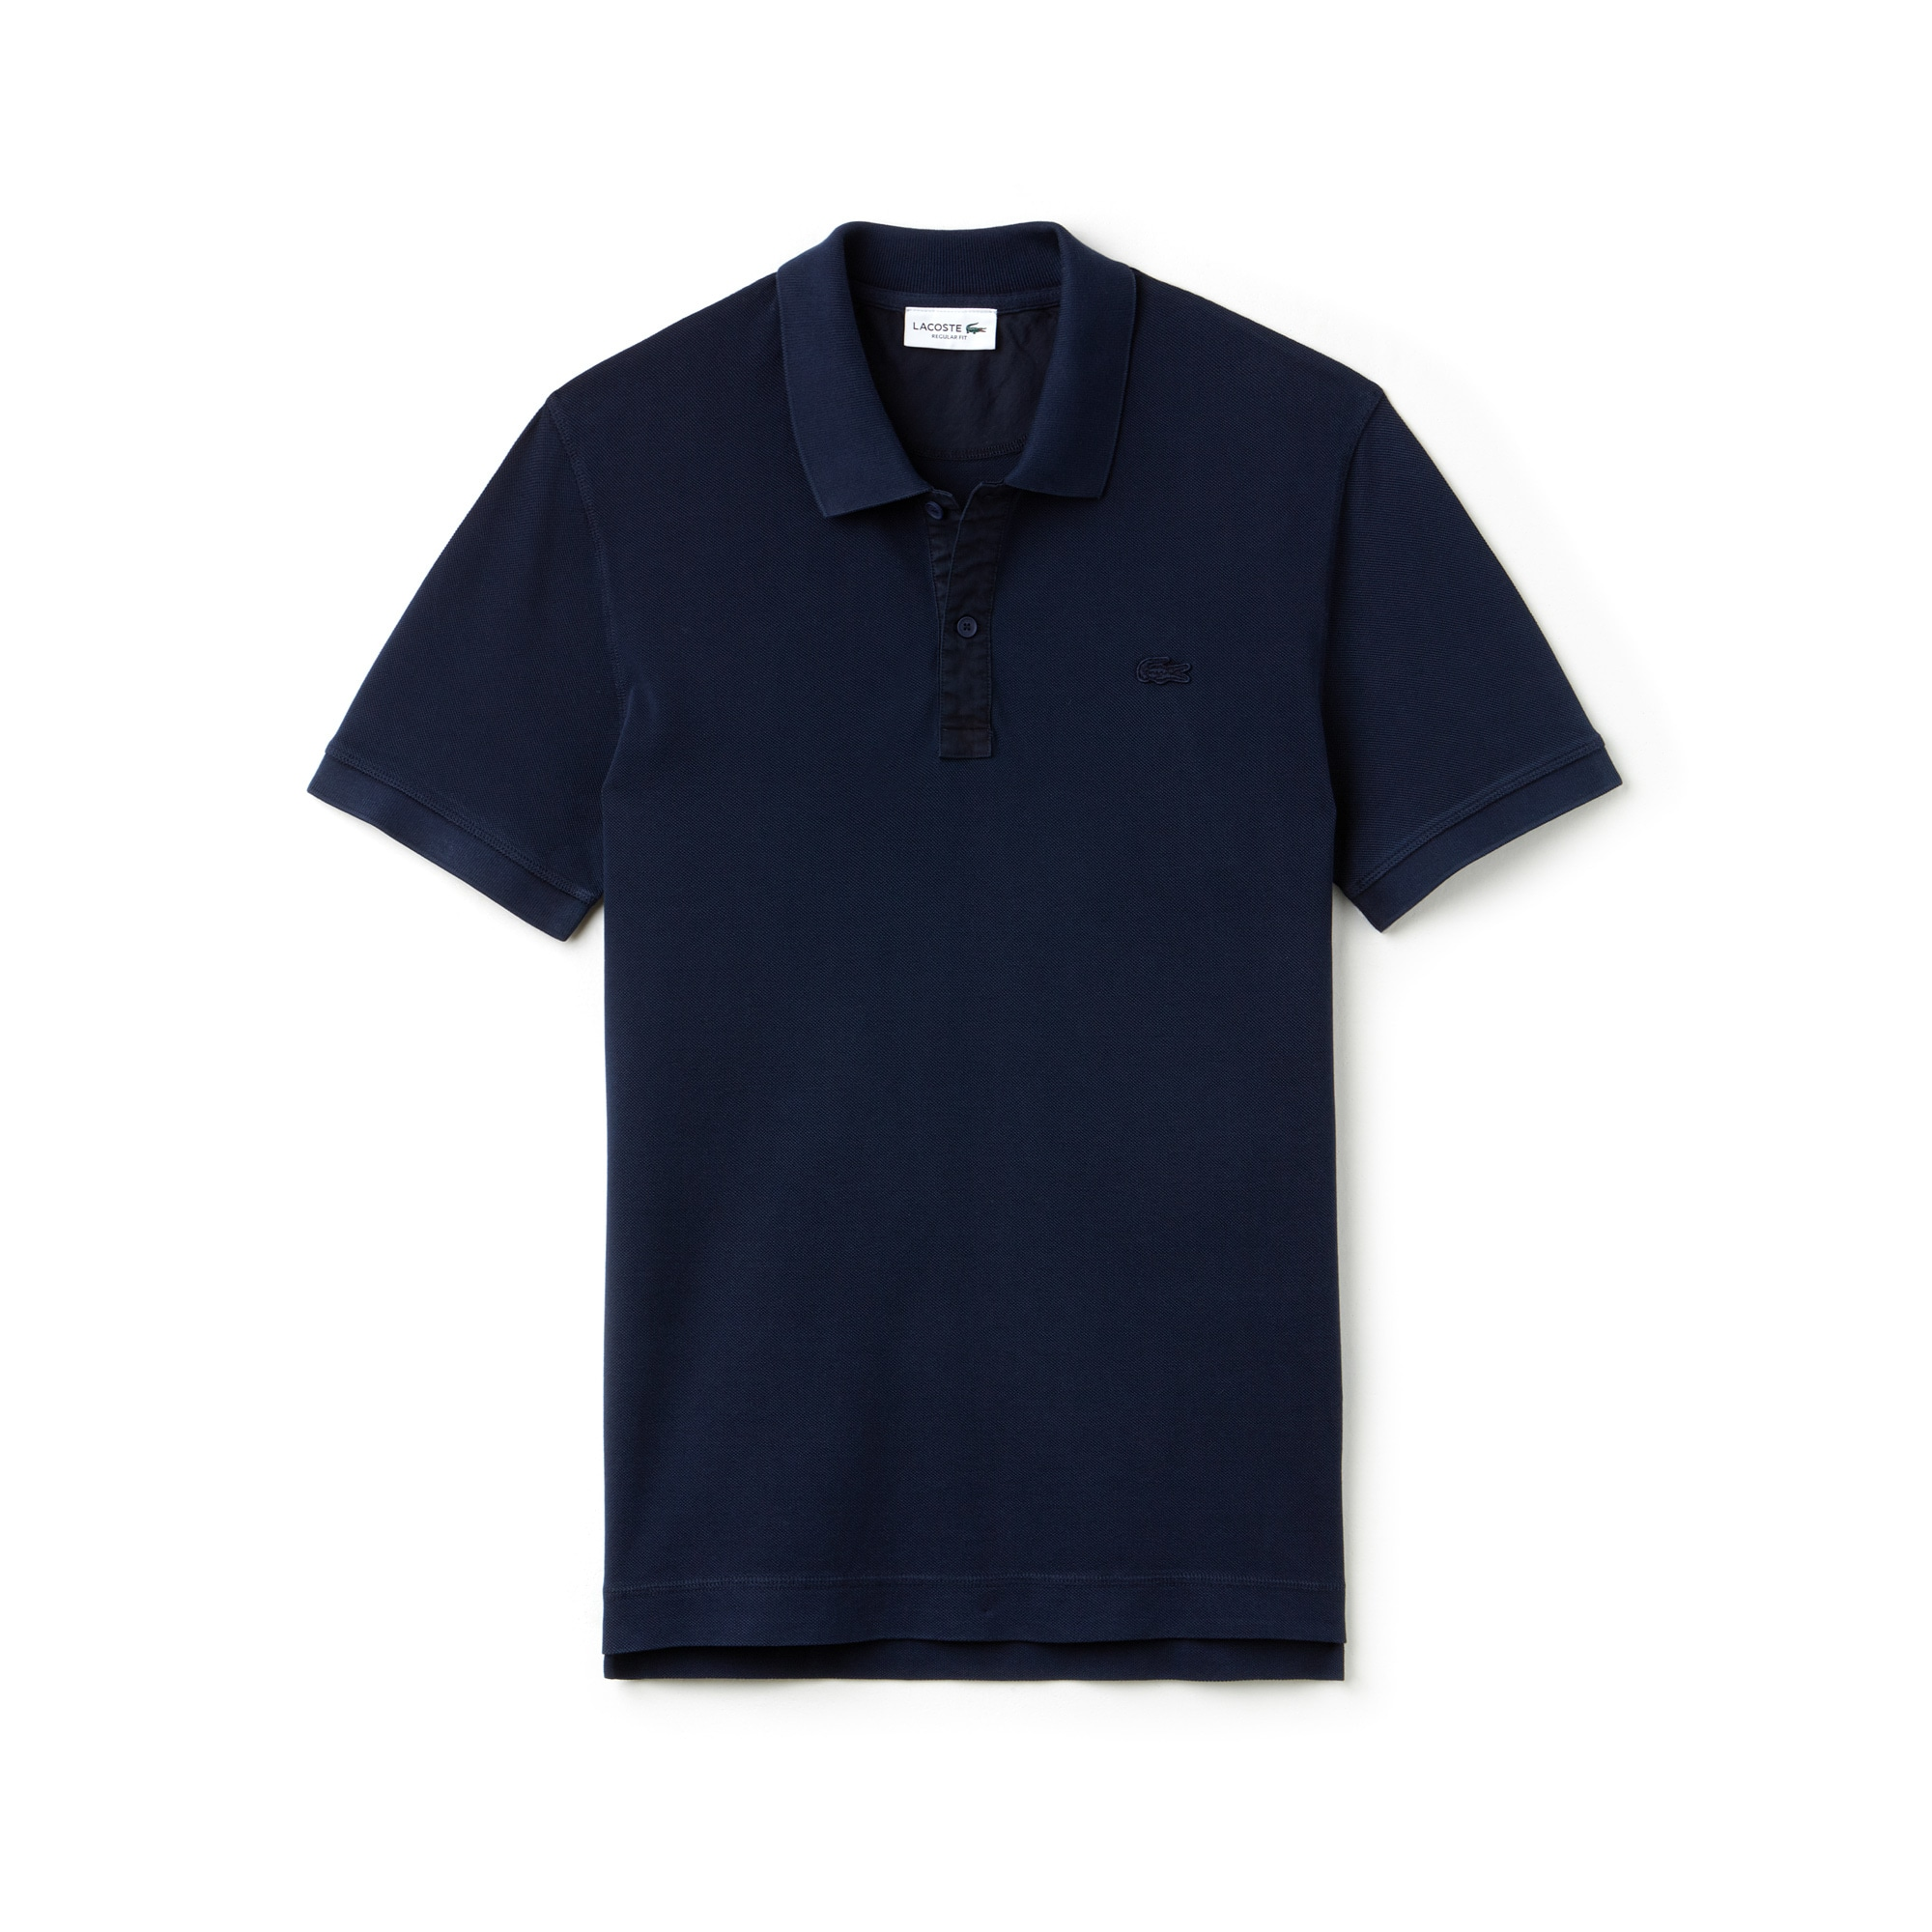 Men's Lacoste Regular Fit Square Knit Polo